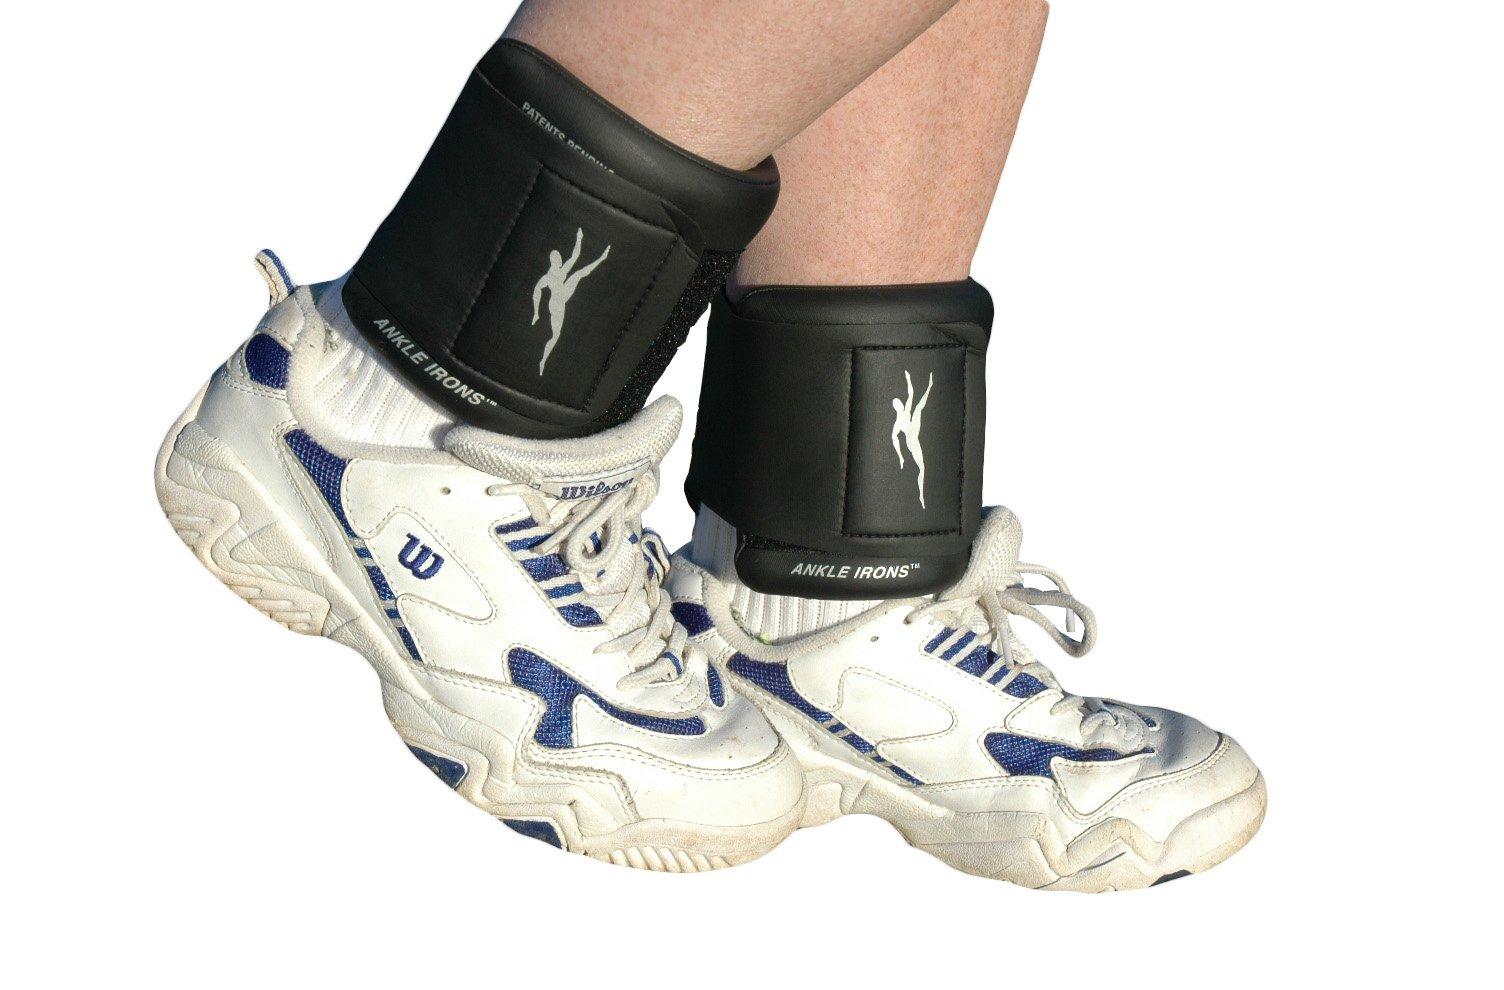 Ironwear Ankle-Wrist Irons Champion SeriesFlex-Metal 2.5lbs Each, 5lb Pair